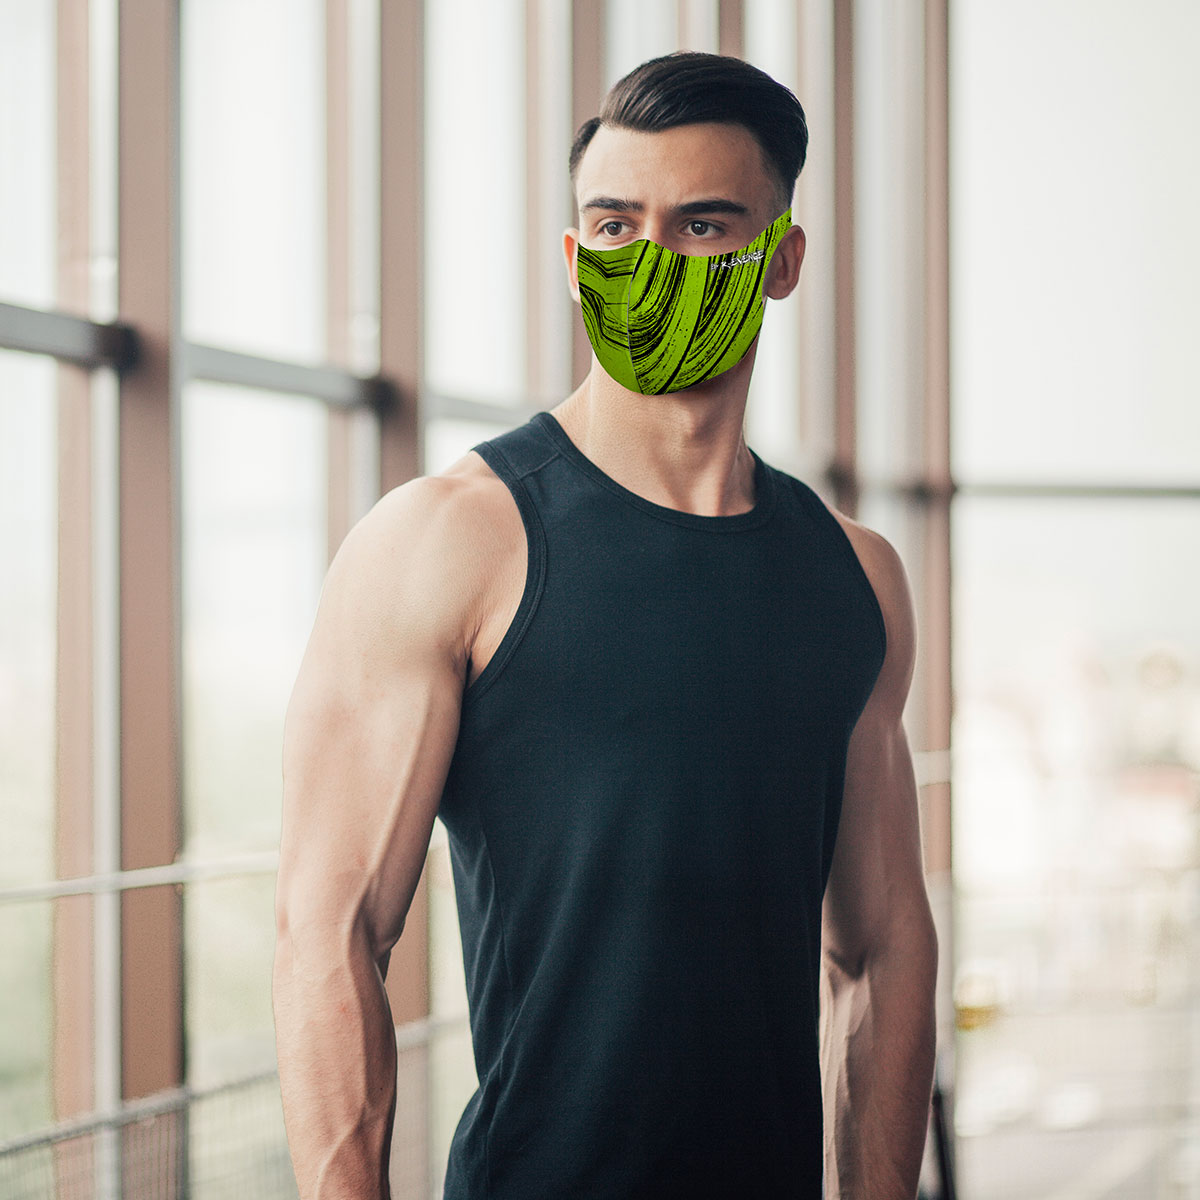 Mascherina Mod.Brush verde uomo